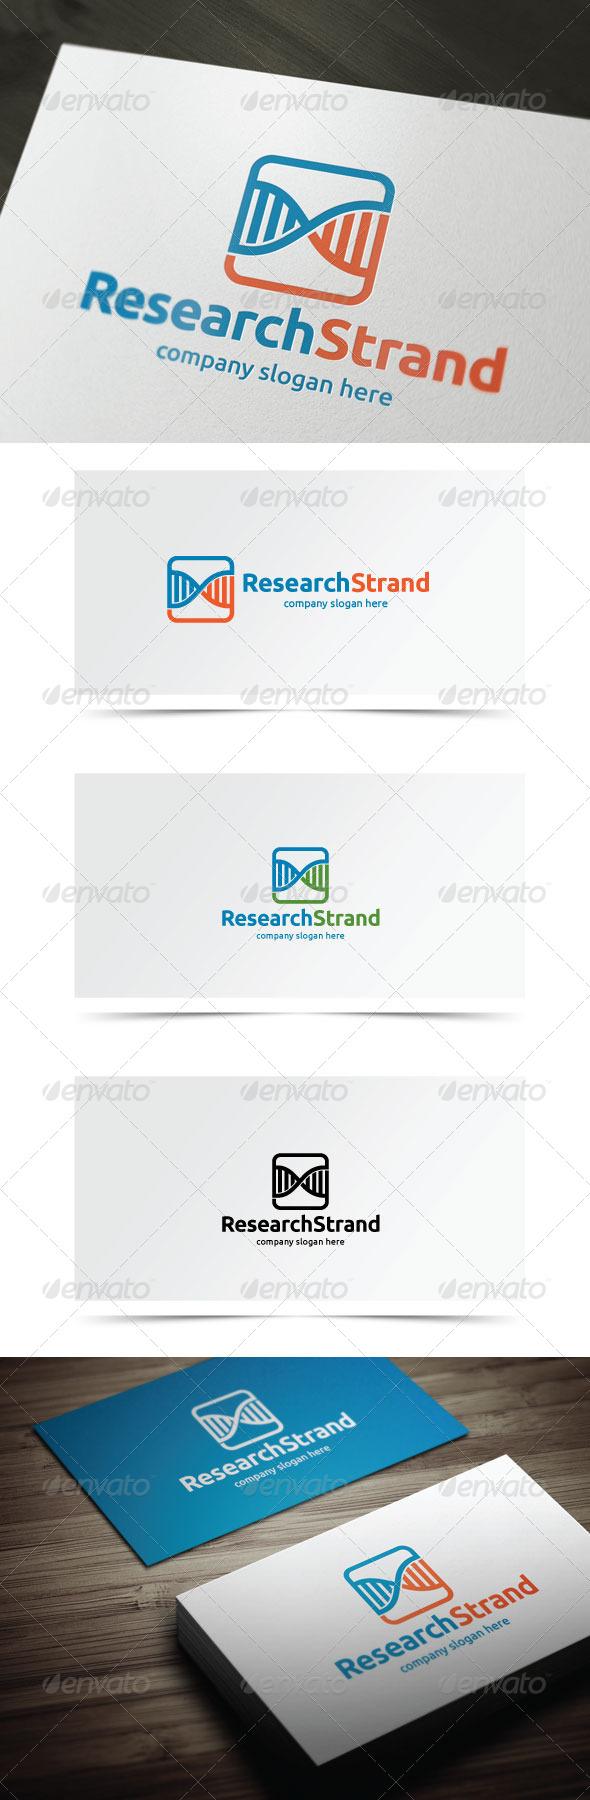 Research Strand - Symbols Logo Templates